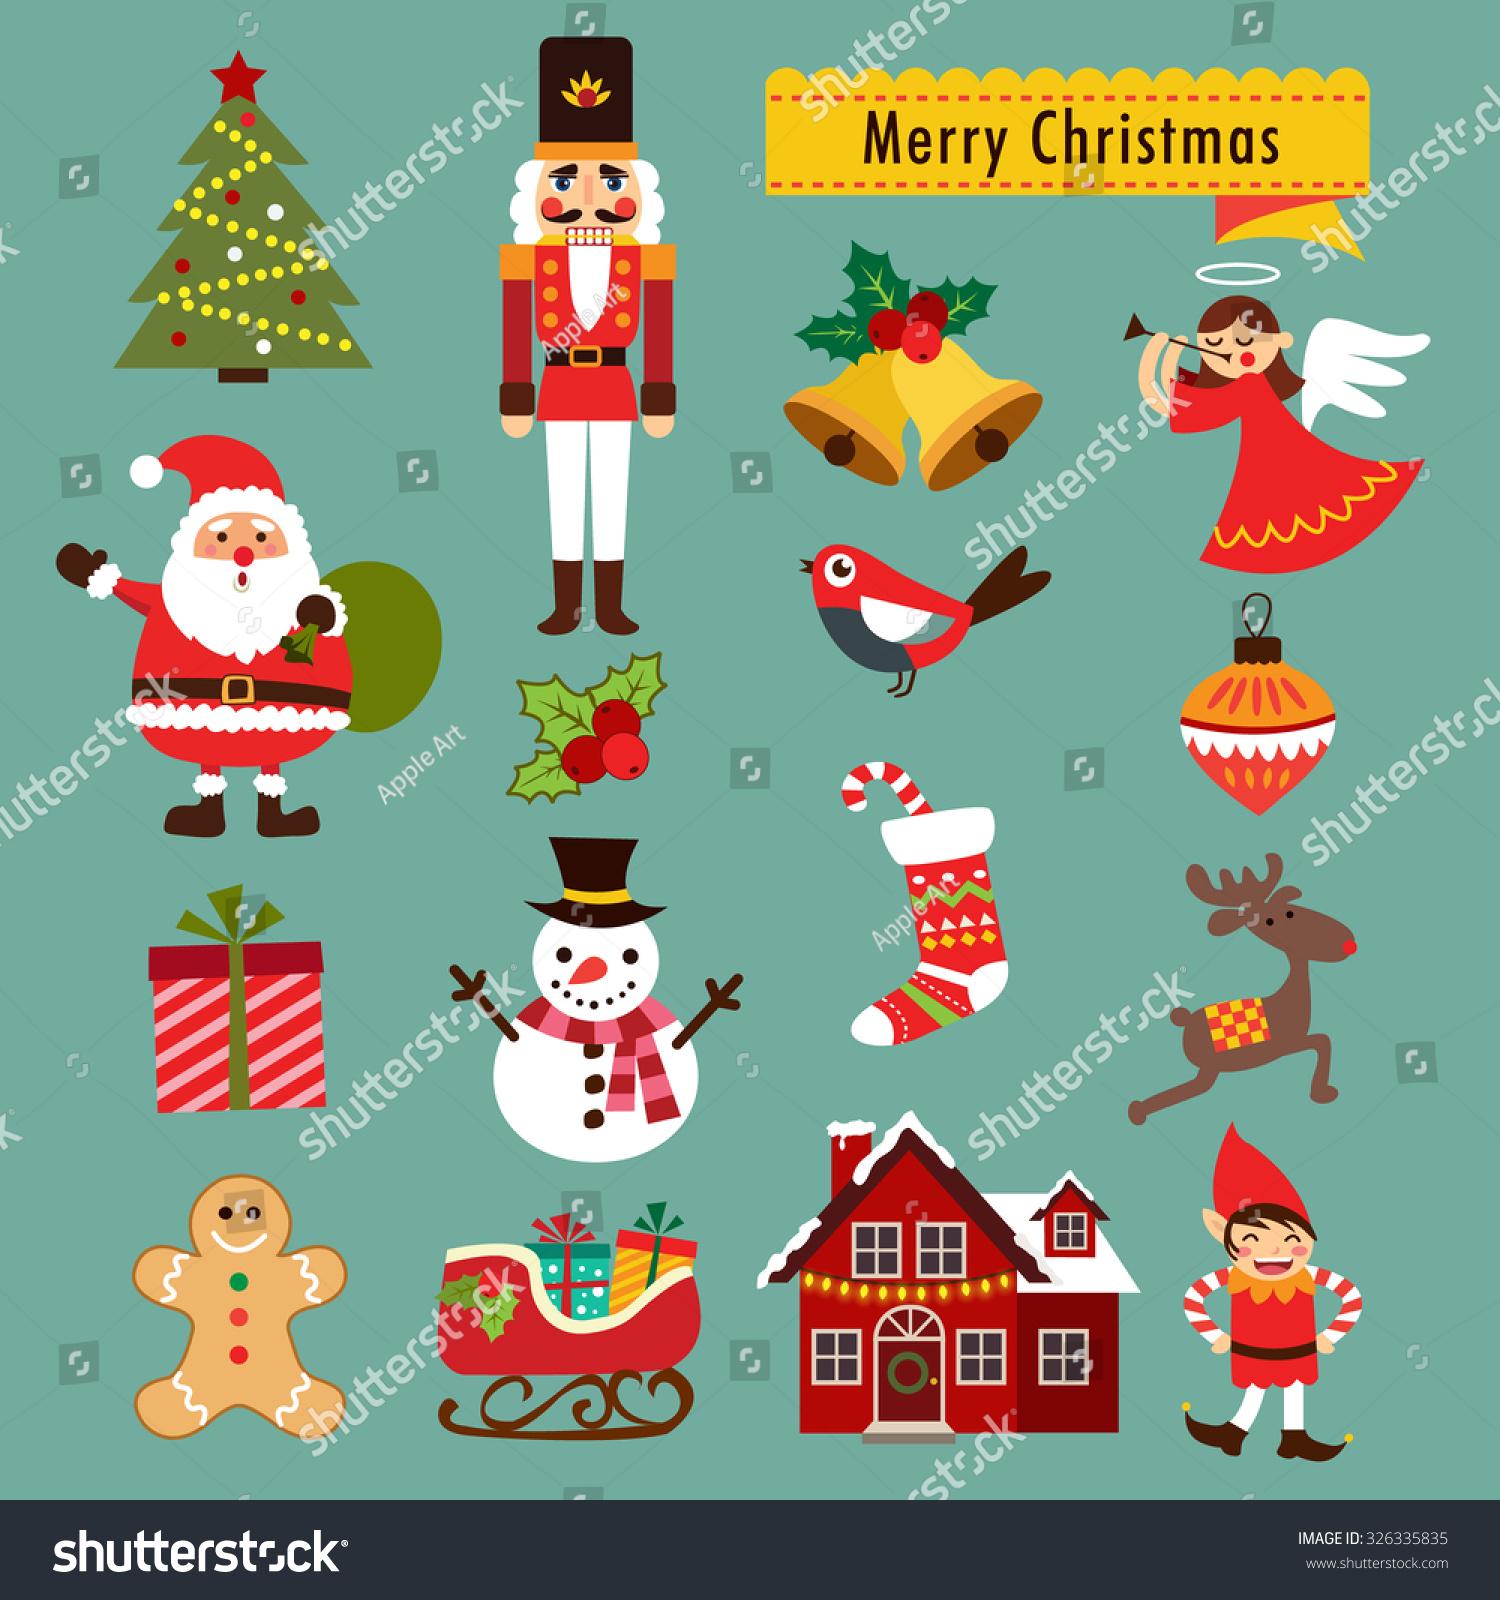 Christmas Tree Decoration Elements: Christmas Decoration Icons Illustration Elements Stock